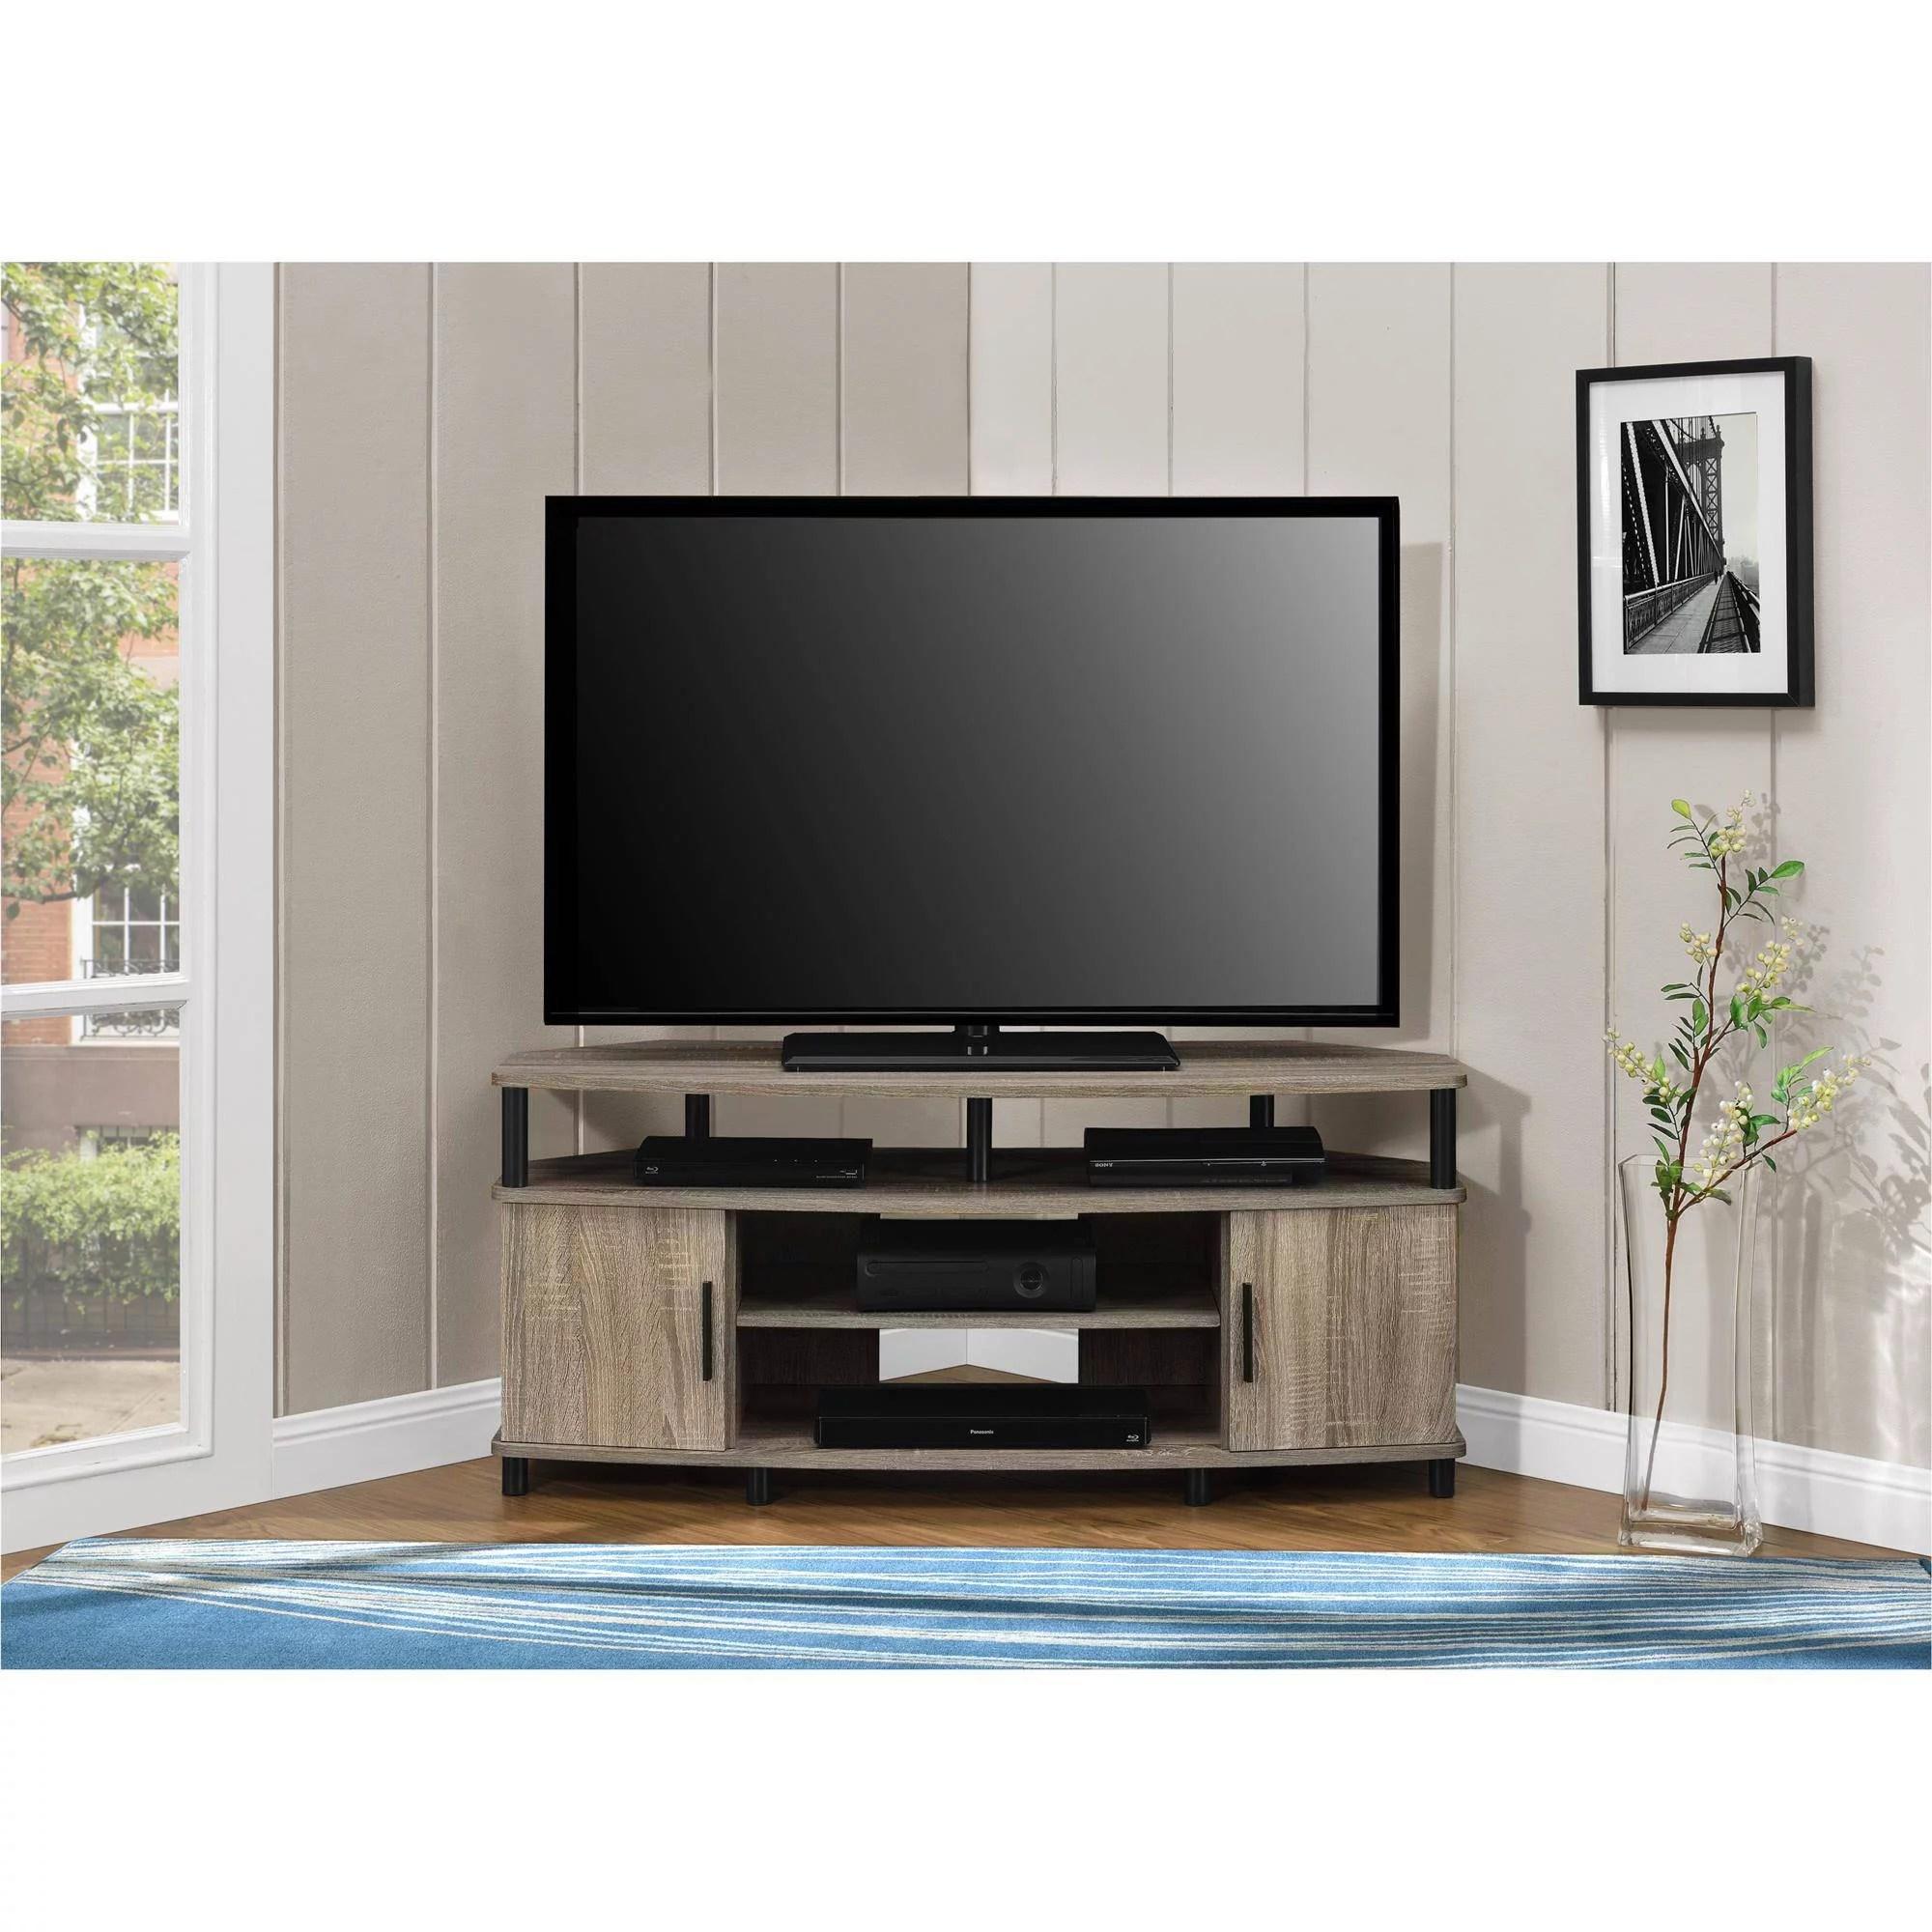 Corner TV Stand Media Console For Flat Screens Sonoma Oak Entertainment Center  eBay